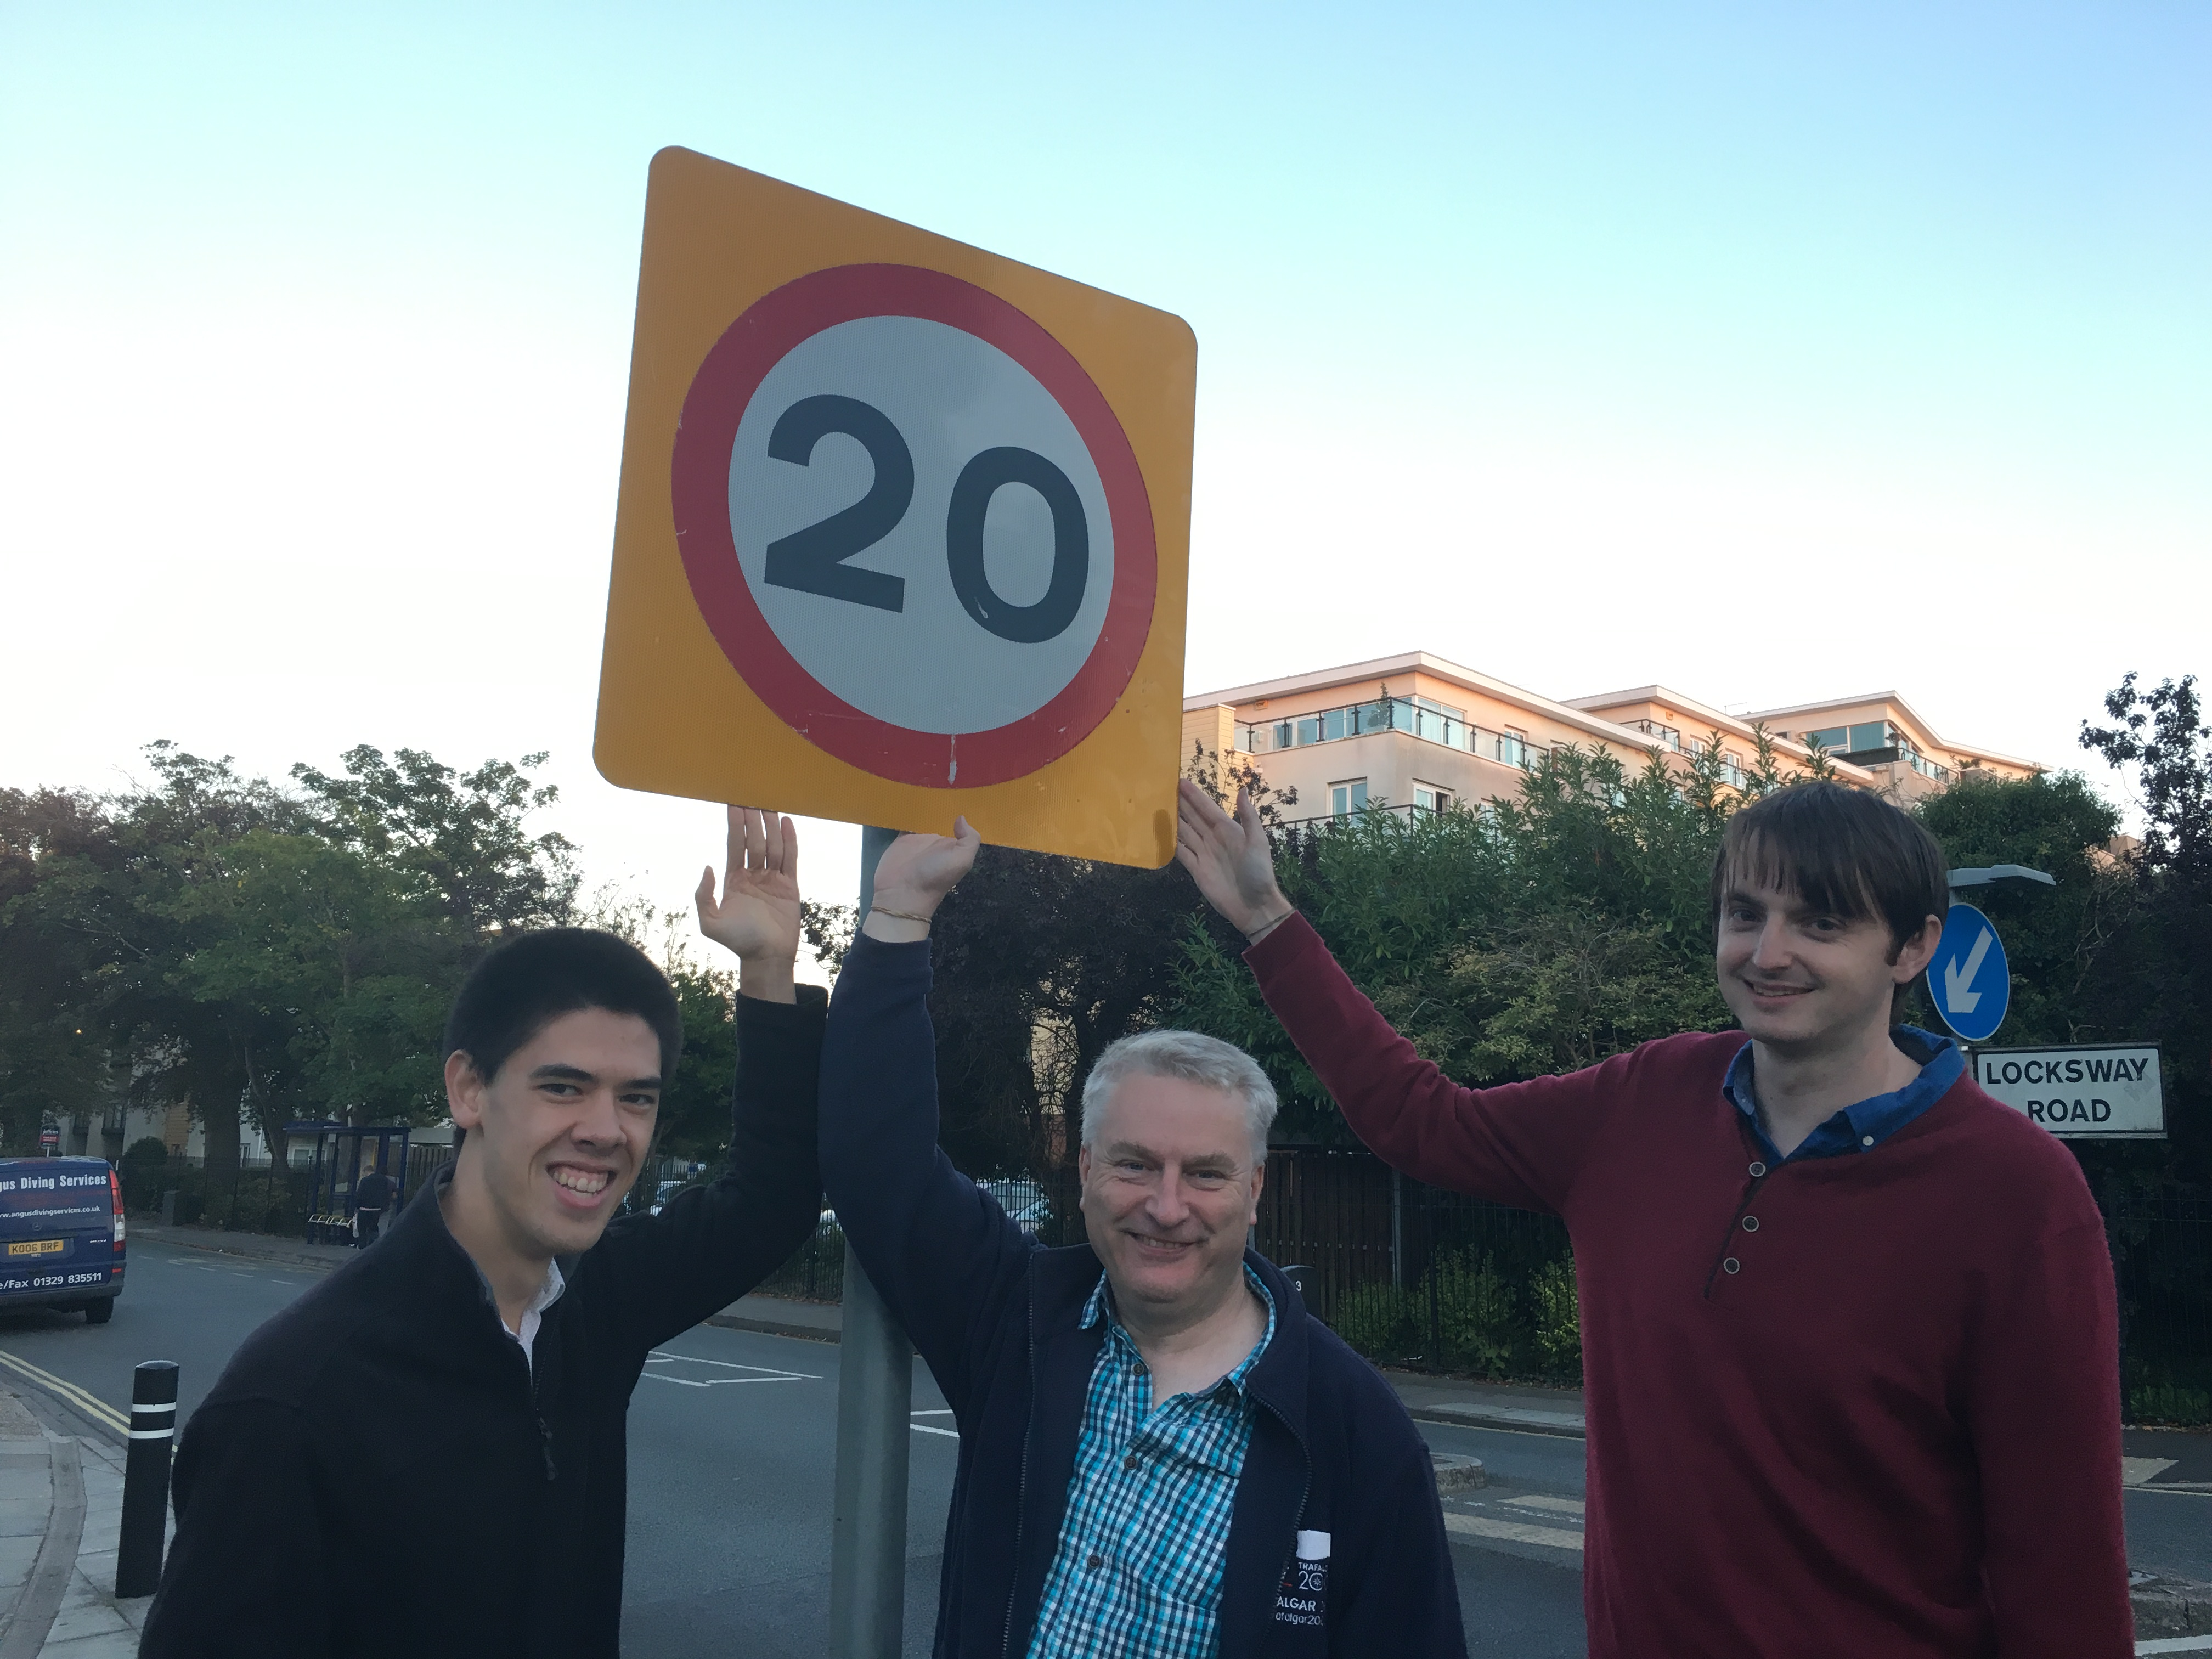 Tackling Speeding on Locksway Road